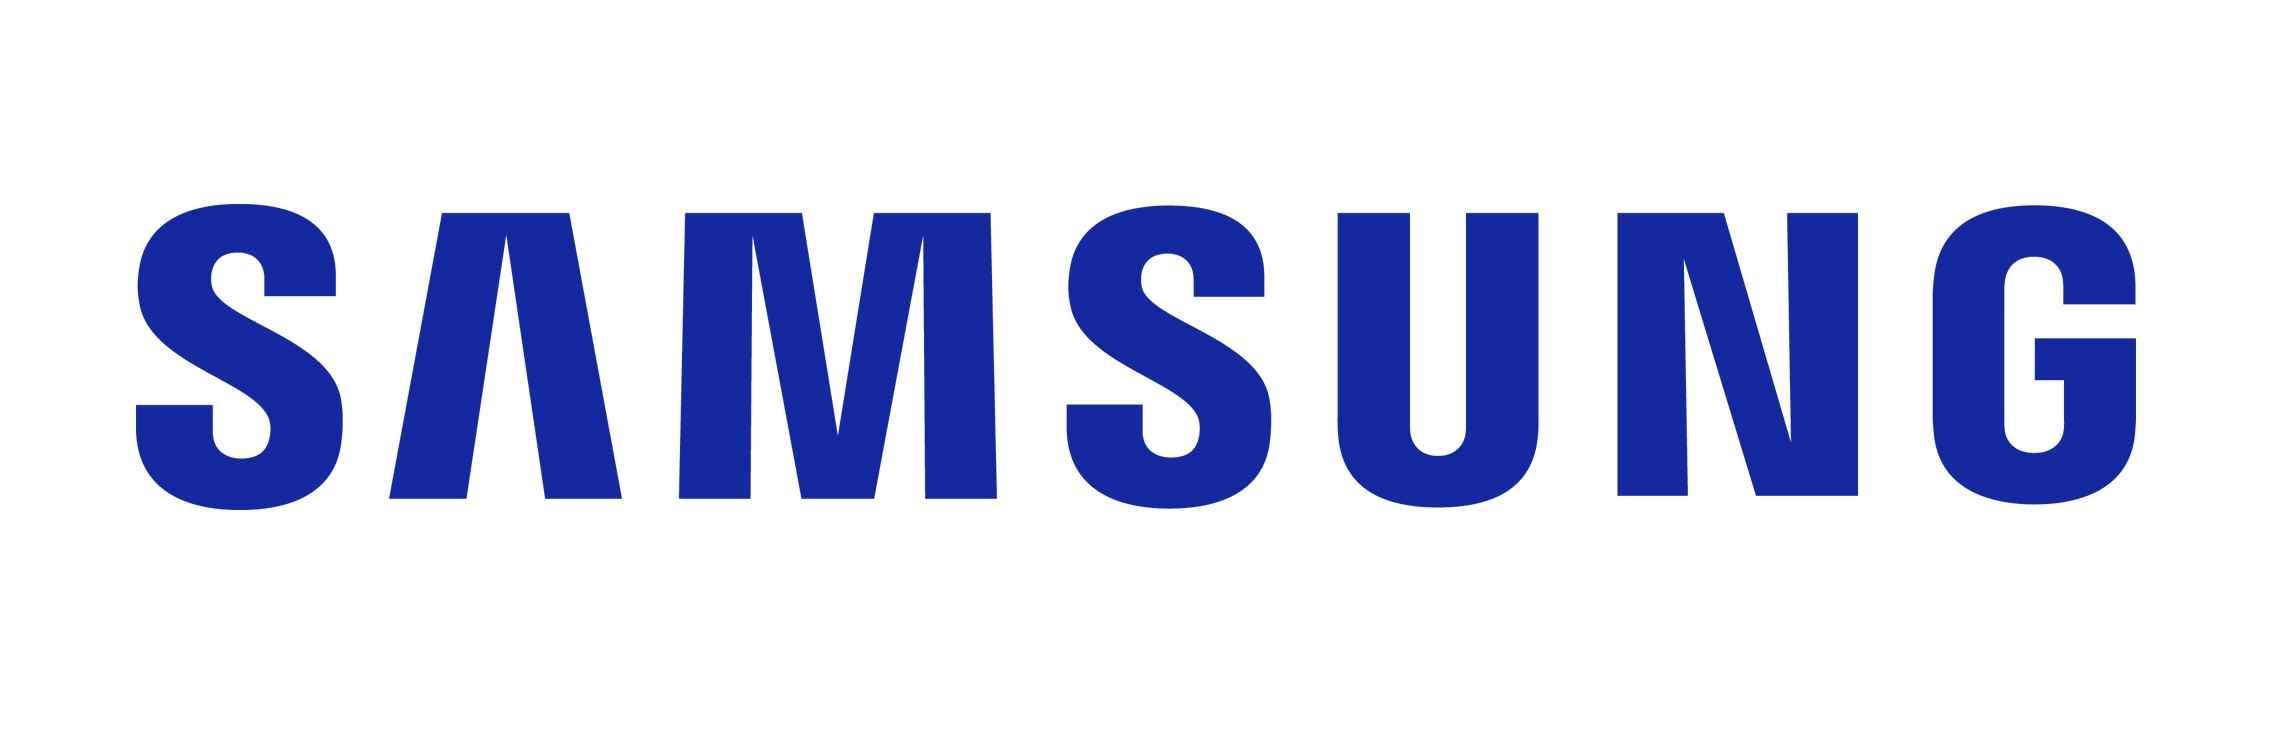 محصولات سامسونگ - SAMSUNG